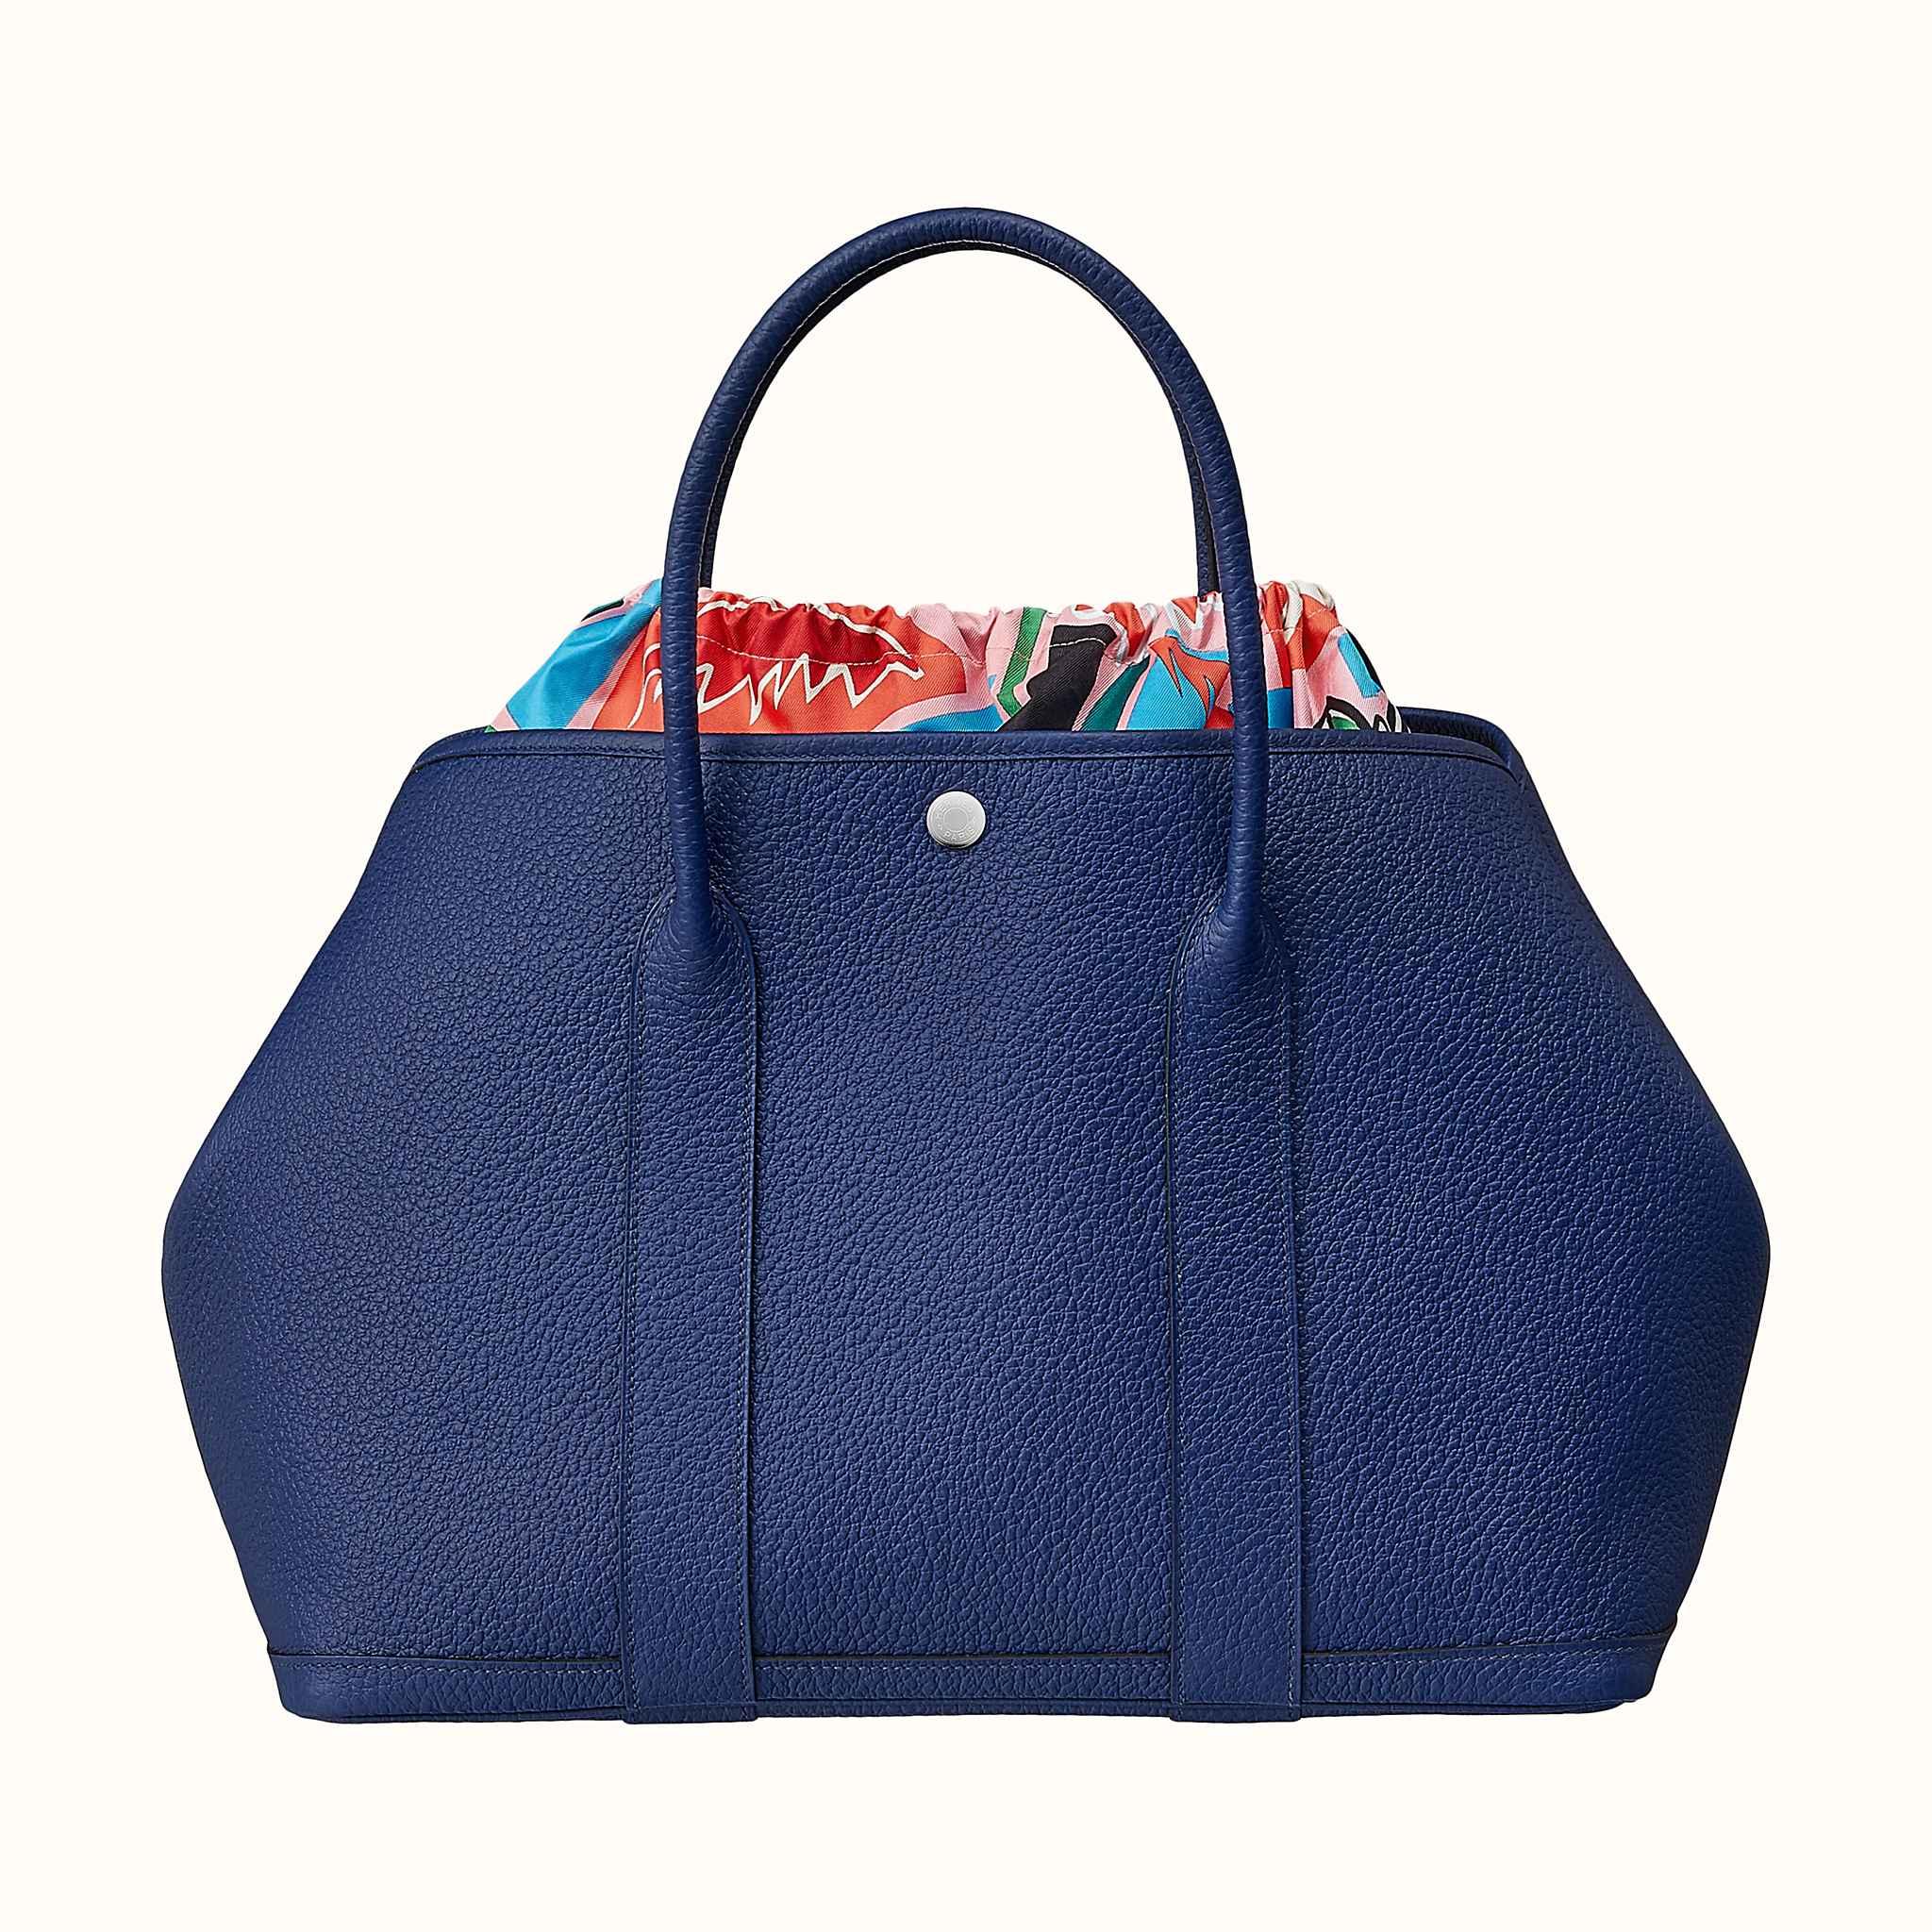 2c82351a1293 Garden Pouch 36 bag